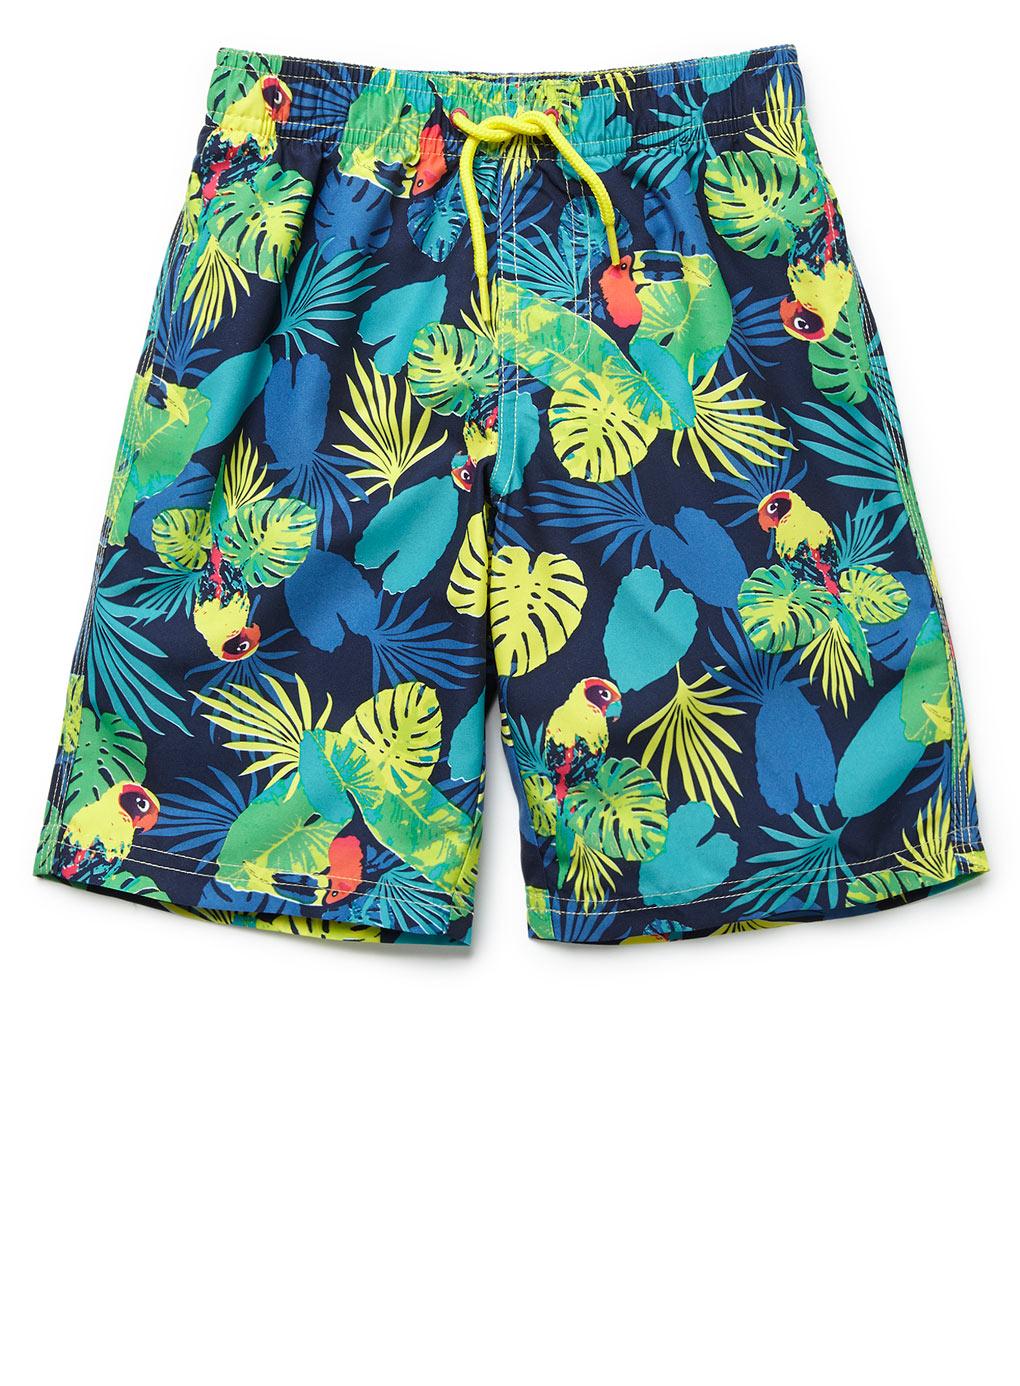 Bhs parrot swim shorts